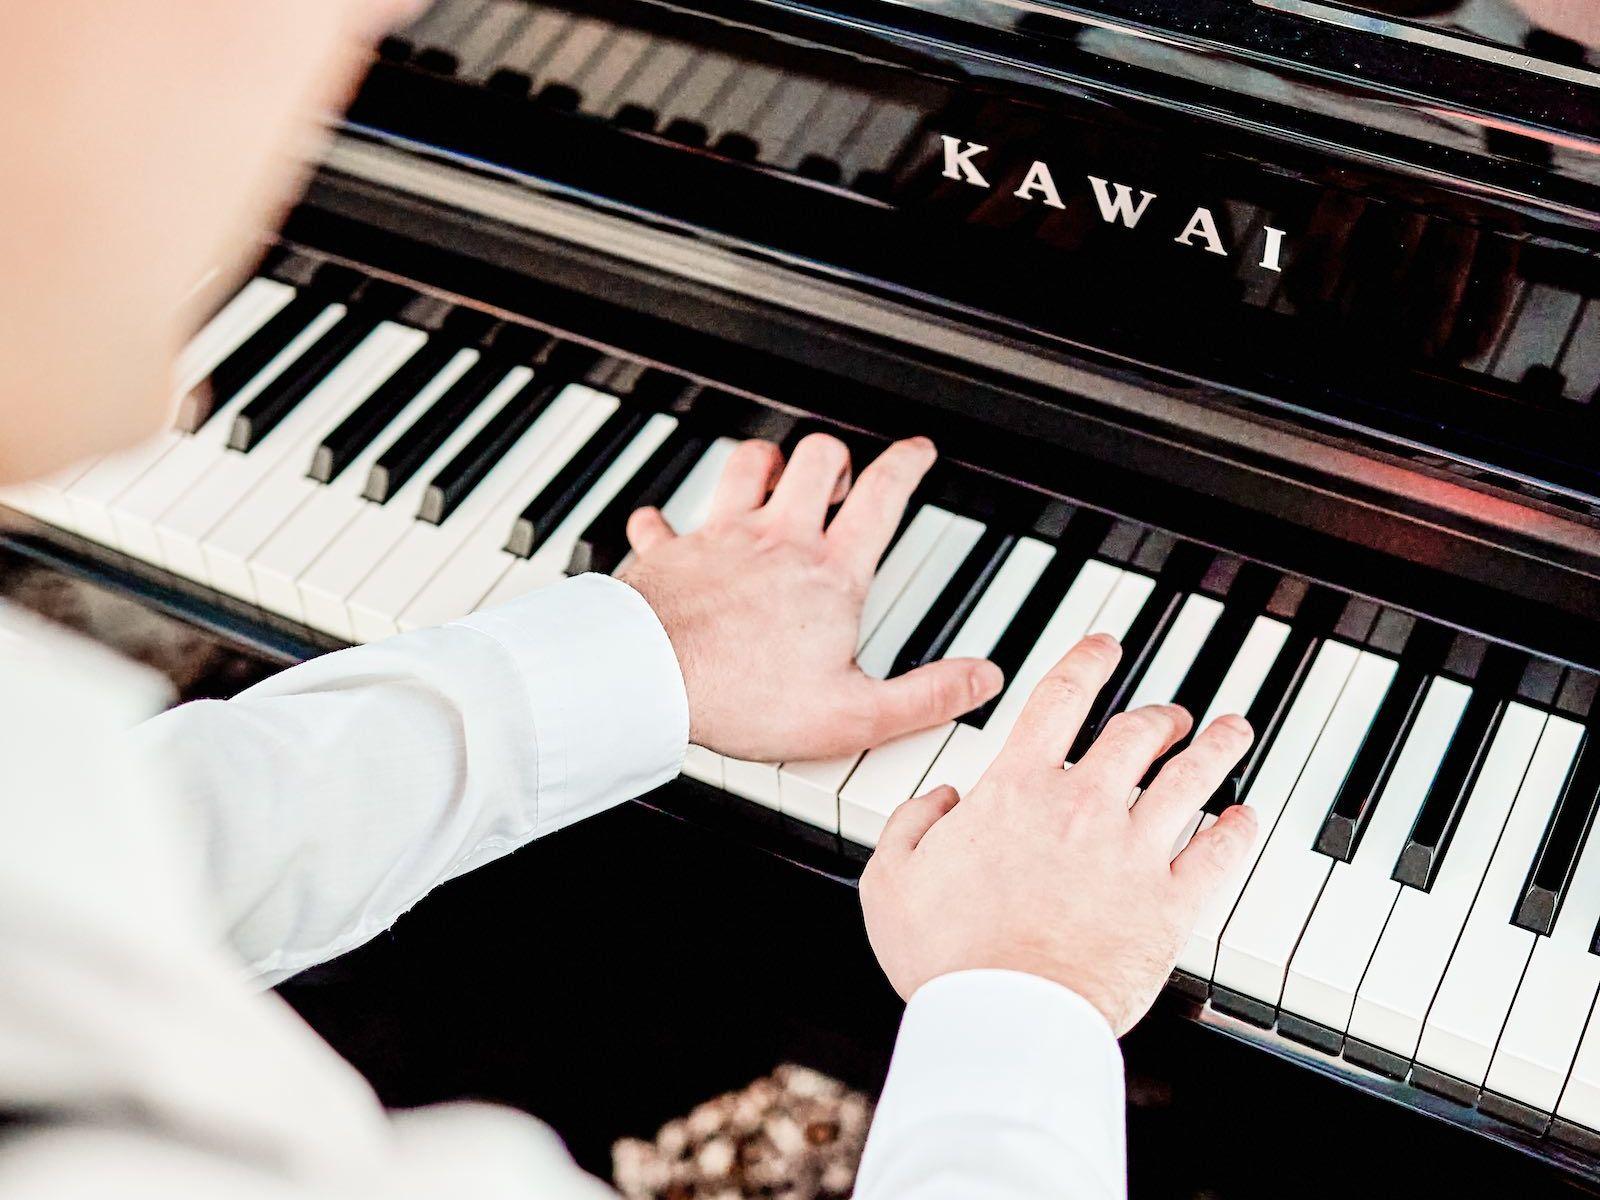 Pianist-Klavierspieler-Barpiano-Barpianist-Hochzeit- | -Empfang-Trauung-Sektempfang-Dinner-Kirche-Buchen-Mieten-Anfragen-Alexander-Barsch-Lehmann-Eventservice